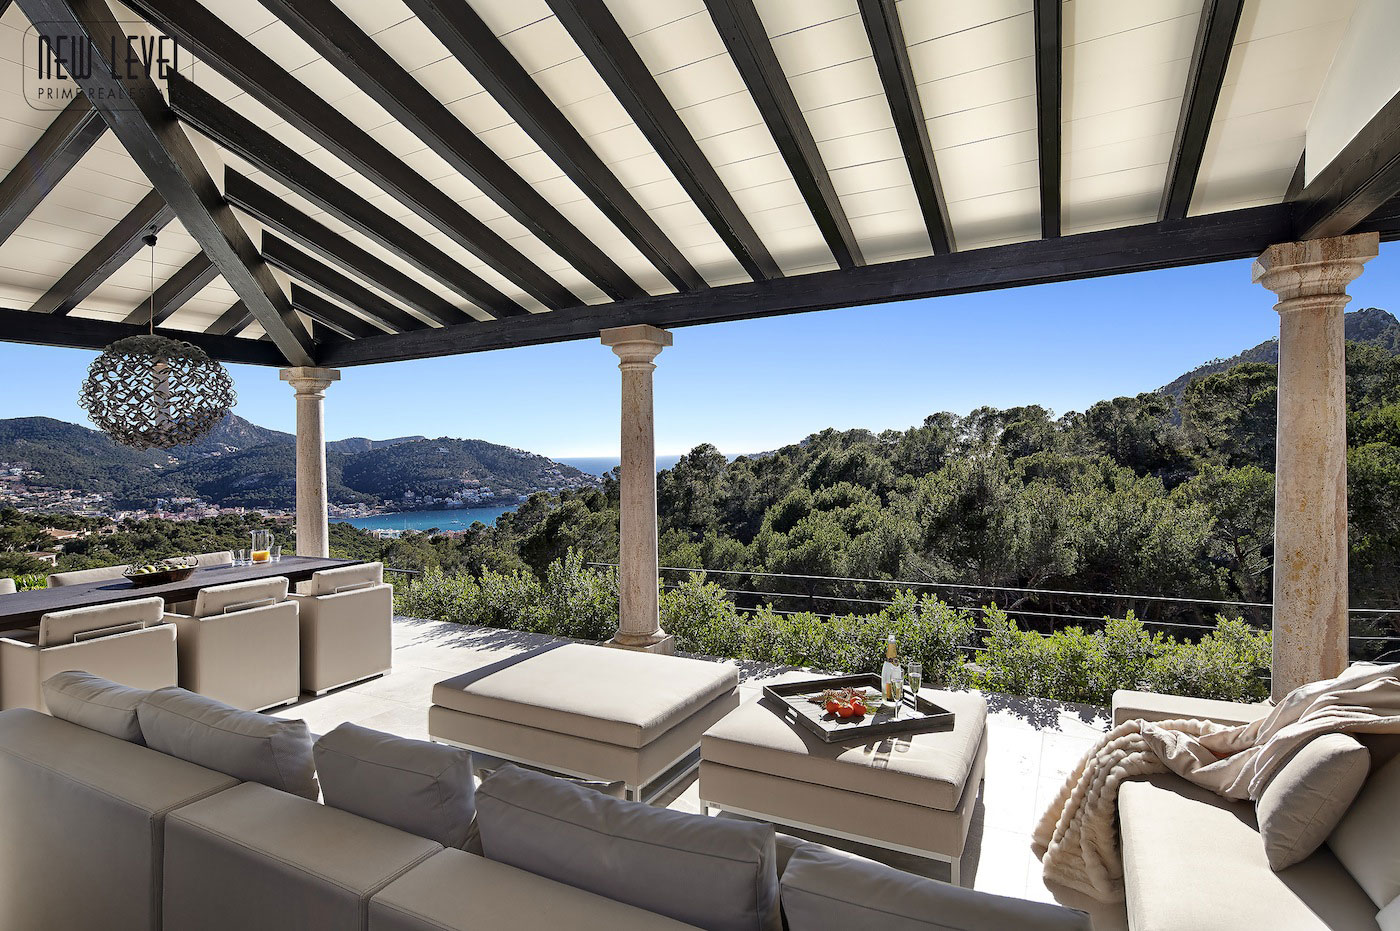 Outdoor Living, Veranda, Views, Fabulous Villa in Puerto de Andratx, Mallorca